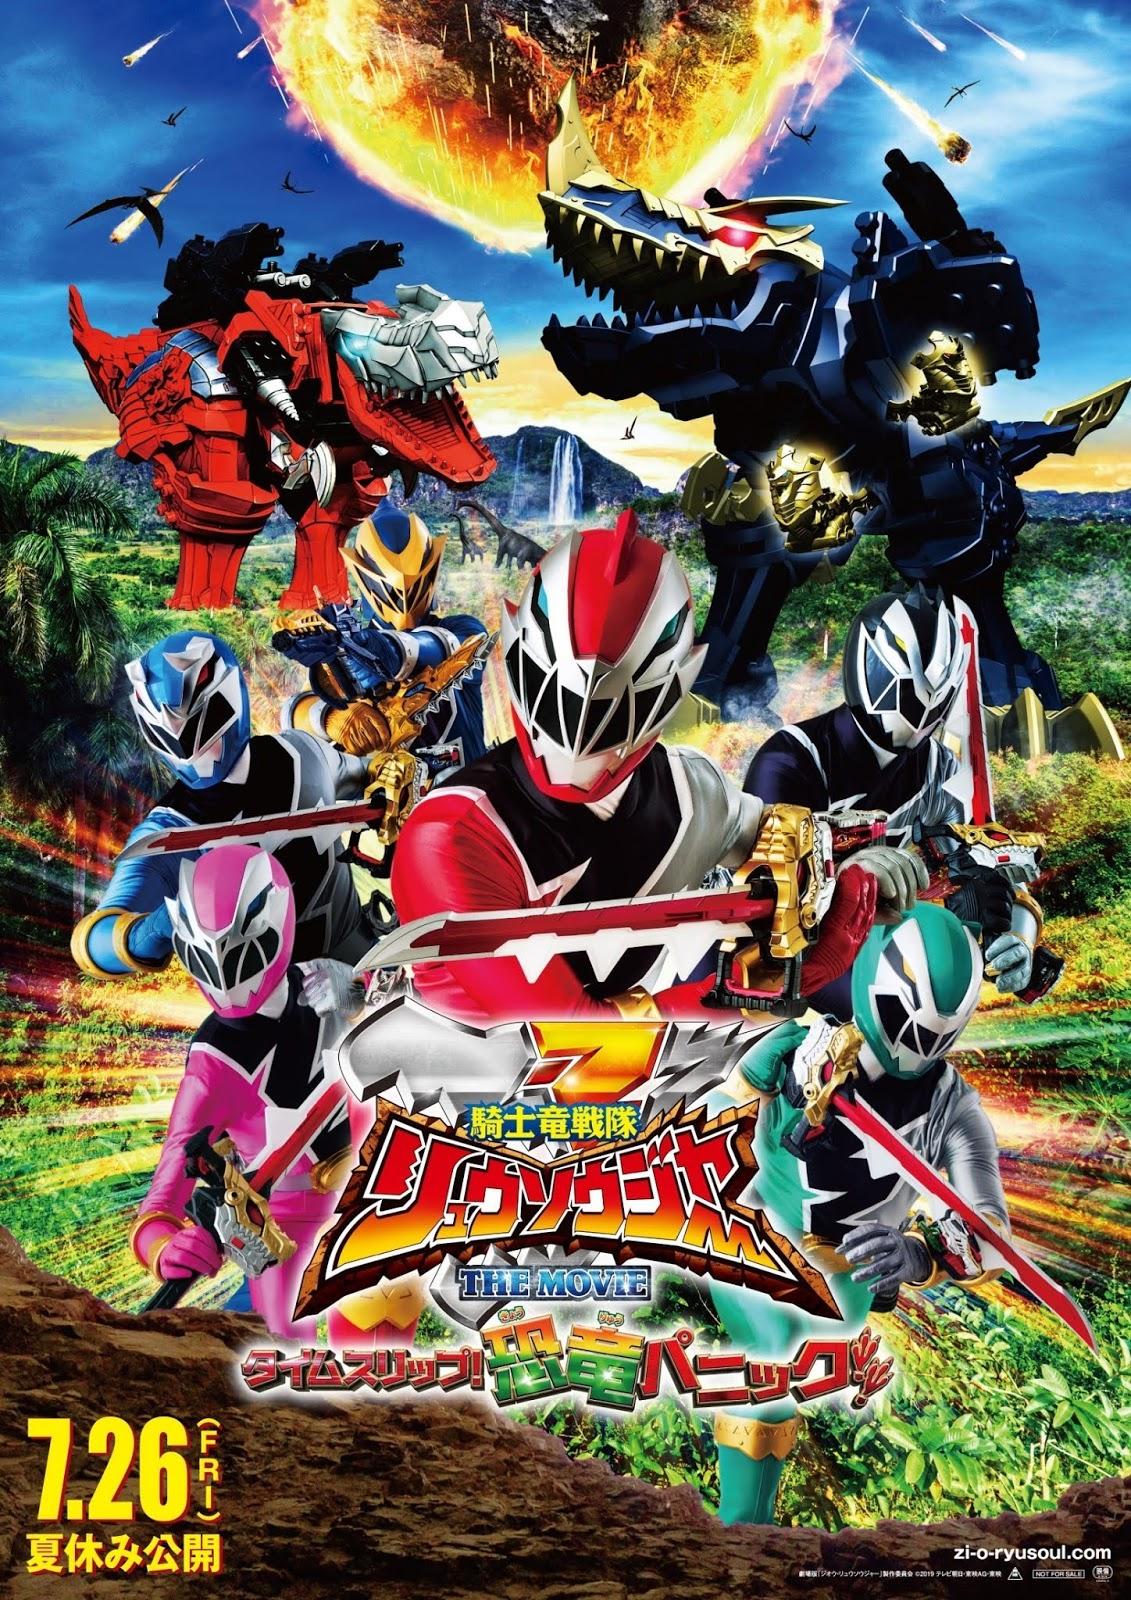 Chiến đội Ma tiến -Mashin Sentai Kiramager